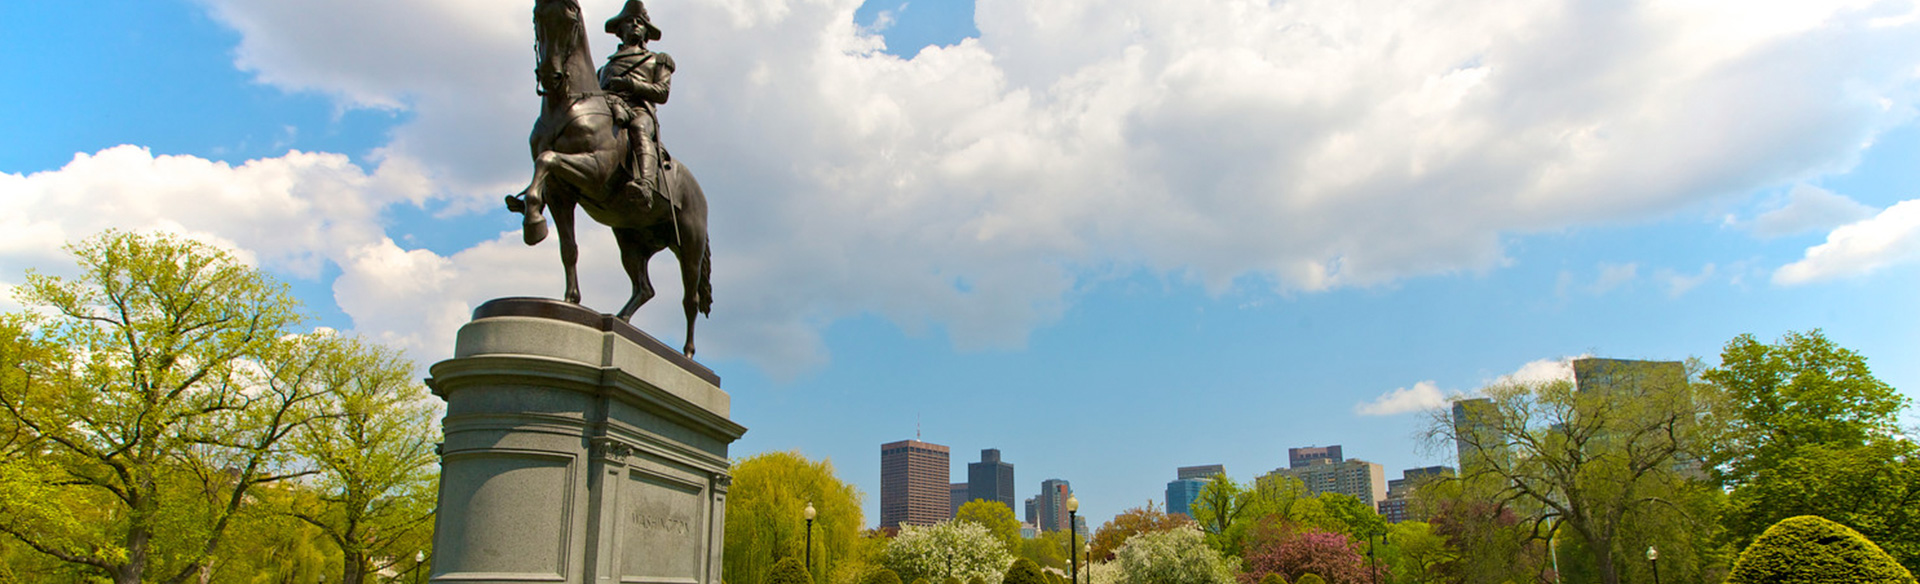 intercambio-em-boston